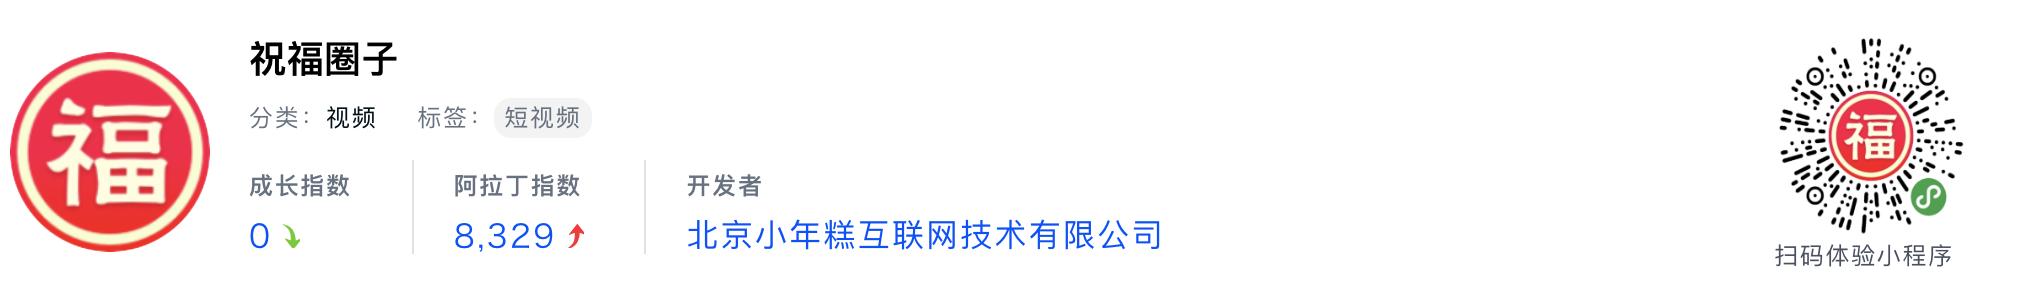 WeChatミニプログラム最新ランキングTOP20【2019年6月版】10位:祝福圈子